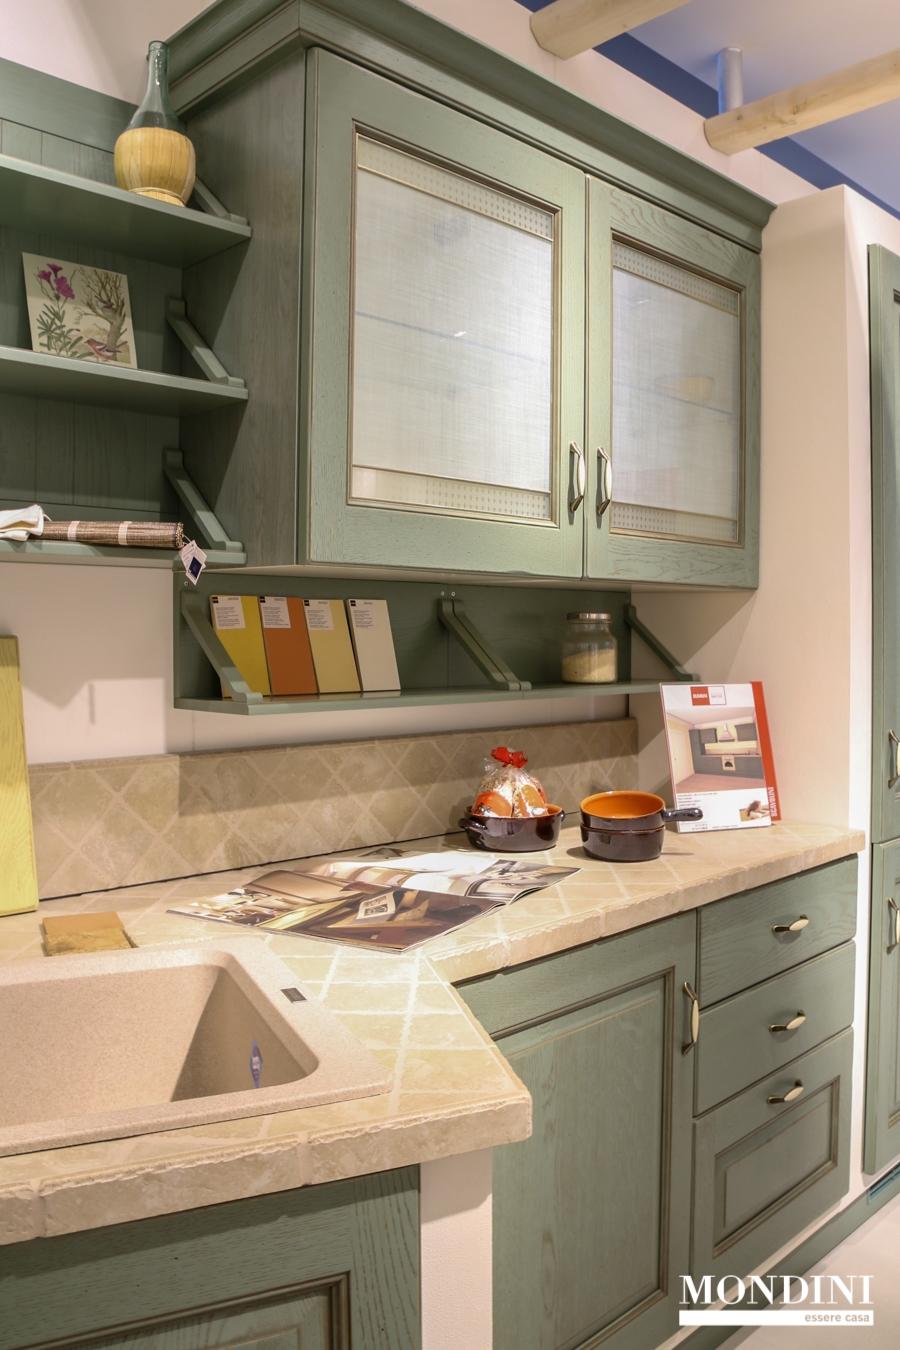 Emejing Cucina Angolo Cottura In Muratura Photos - Embercreative ...